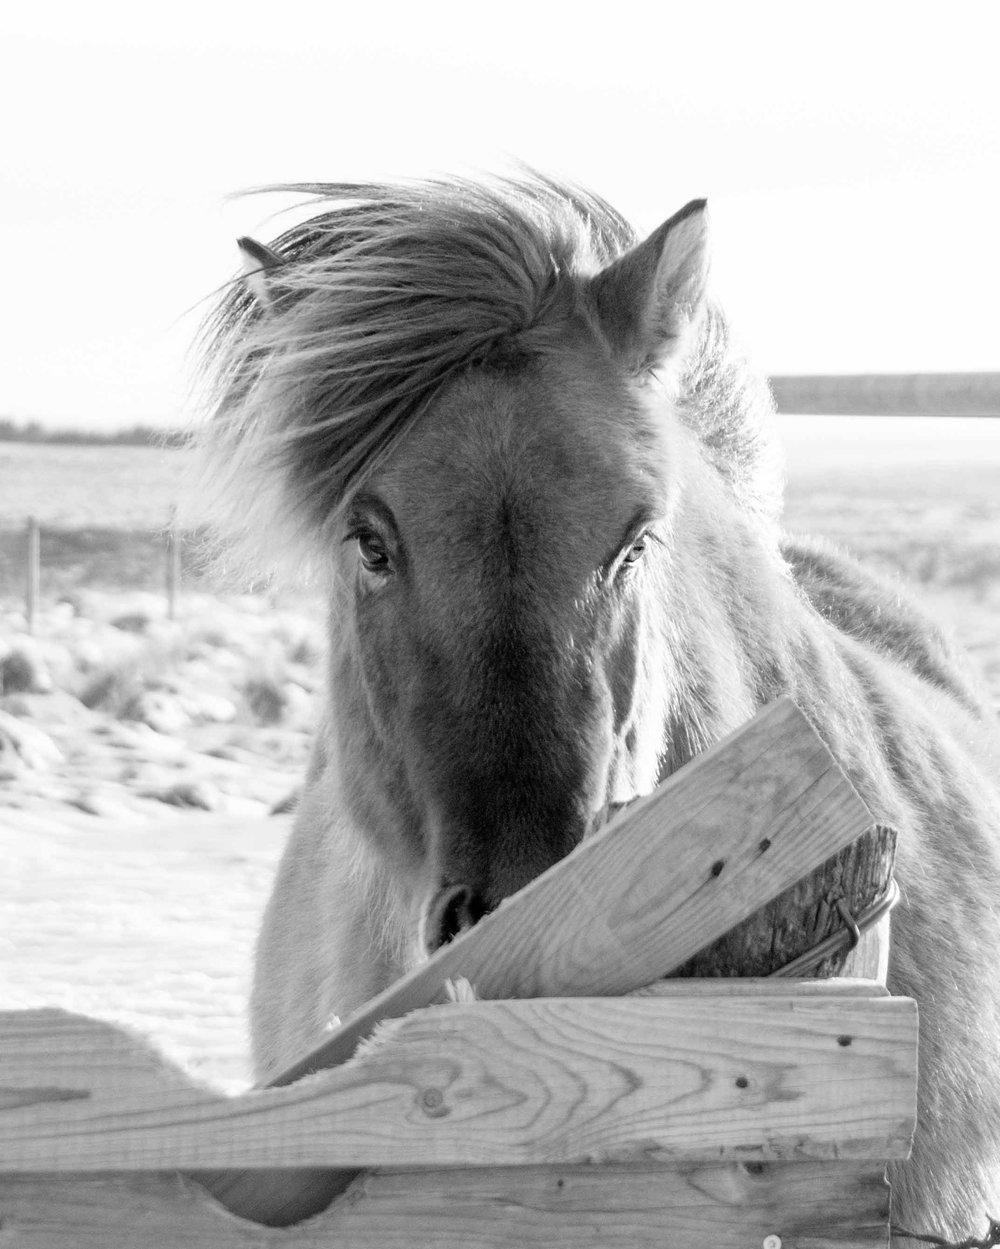 Iceland_Horses_11232017_01.jpg